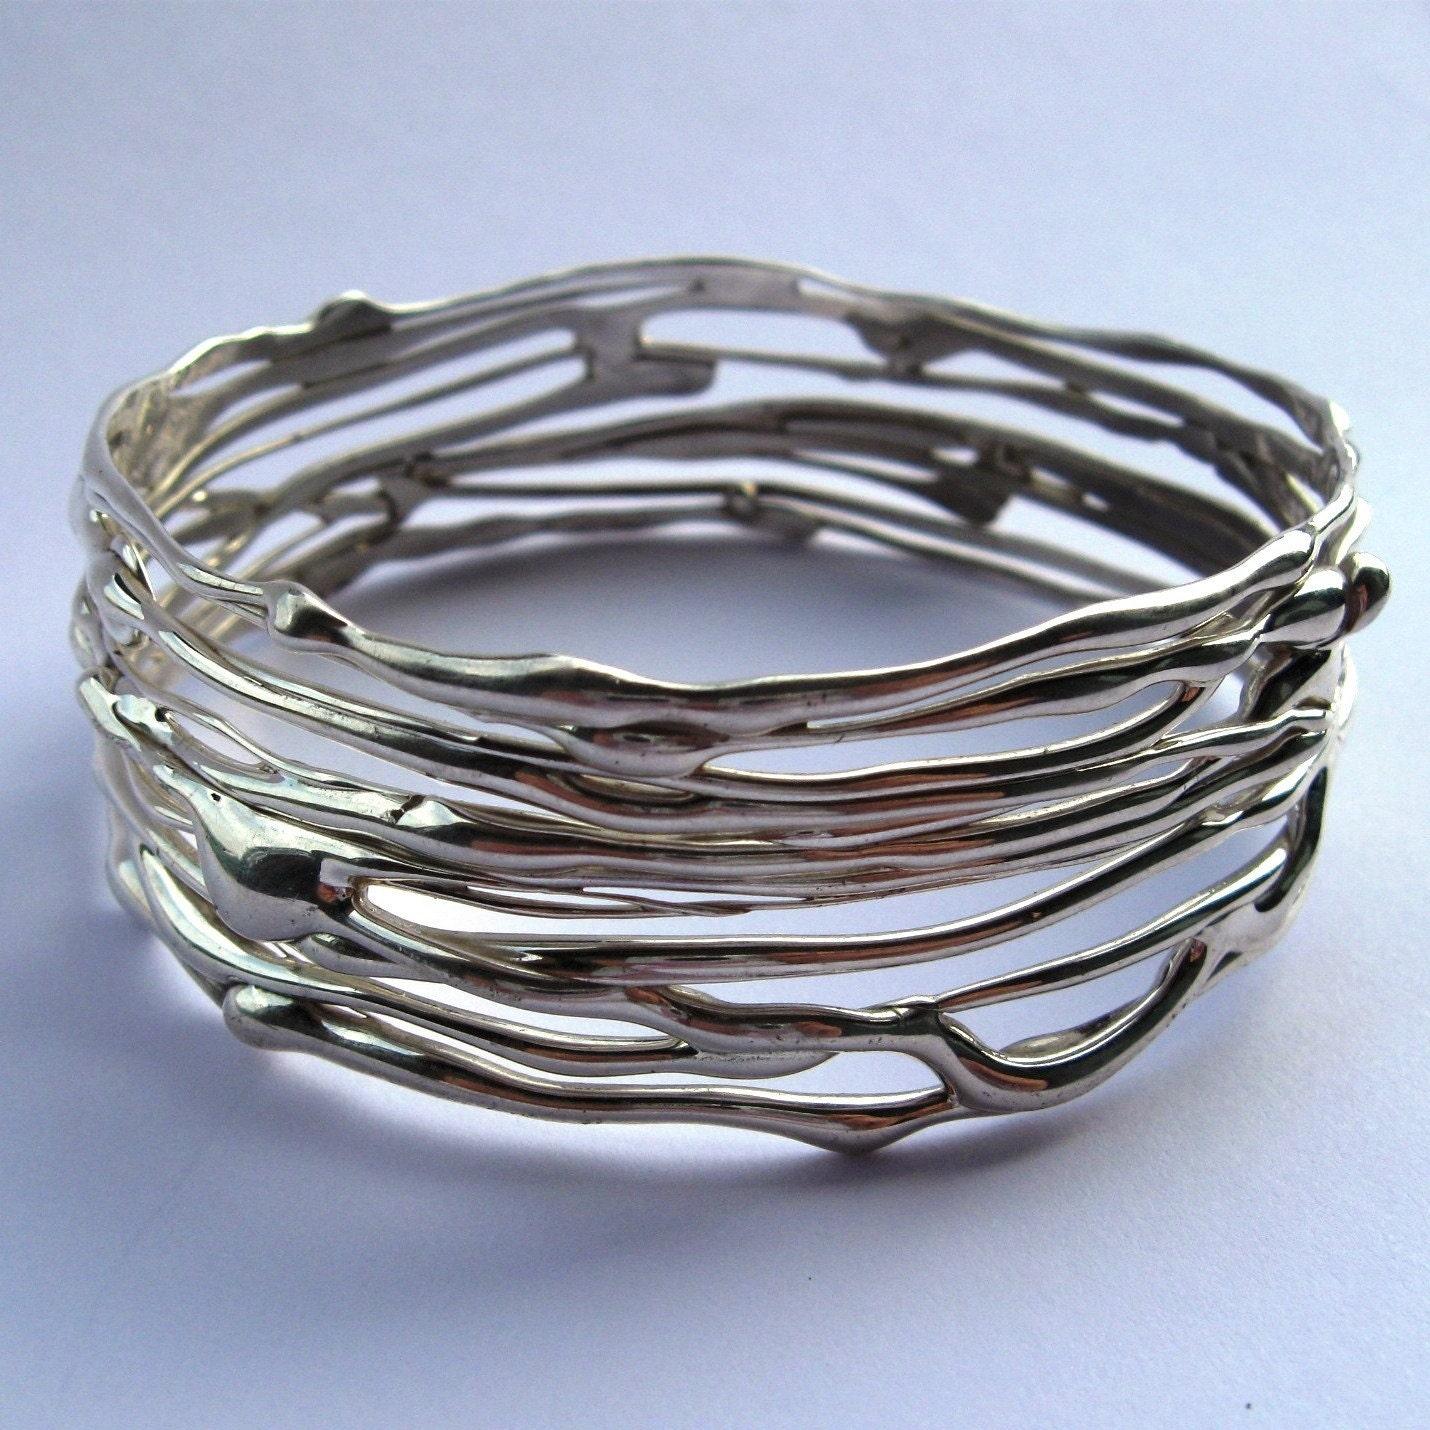 Sterling Silver Bangle Bracelet.